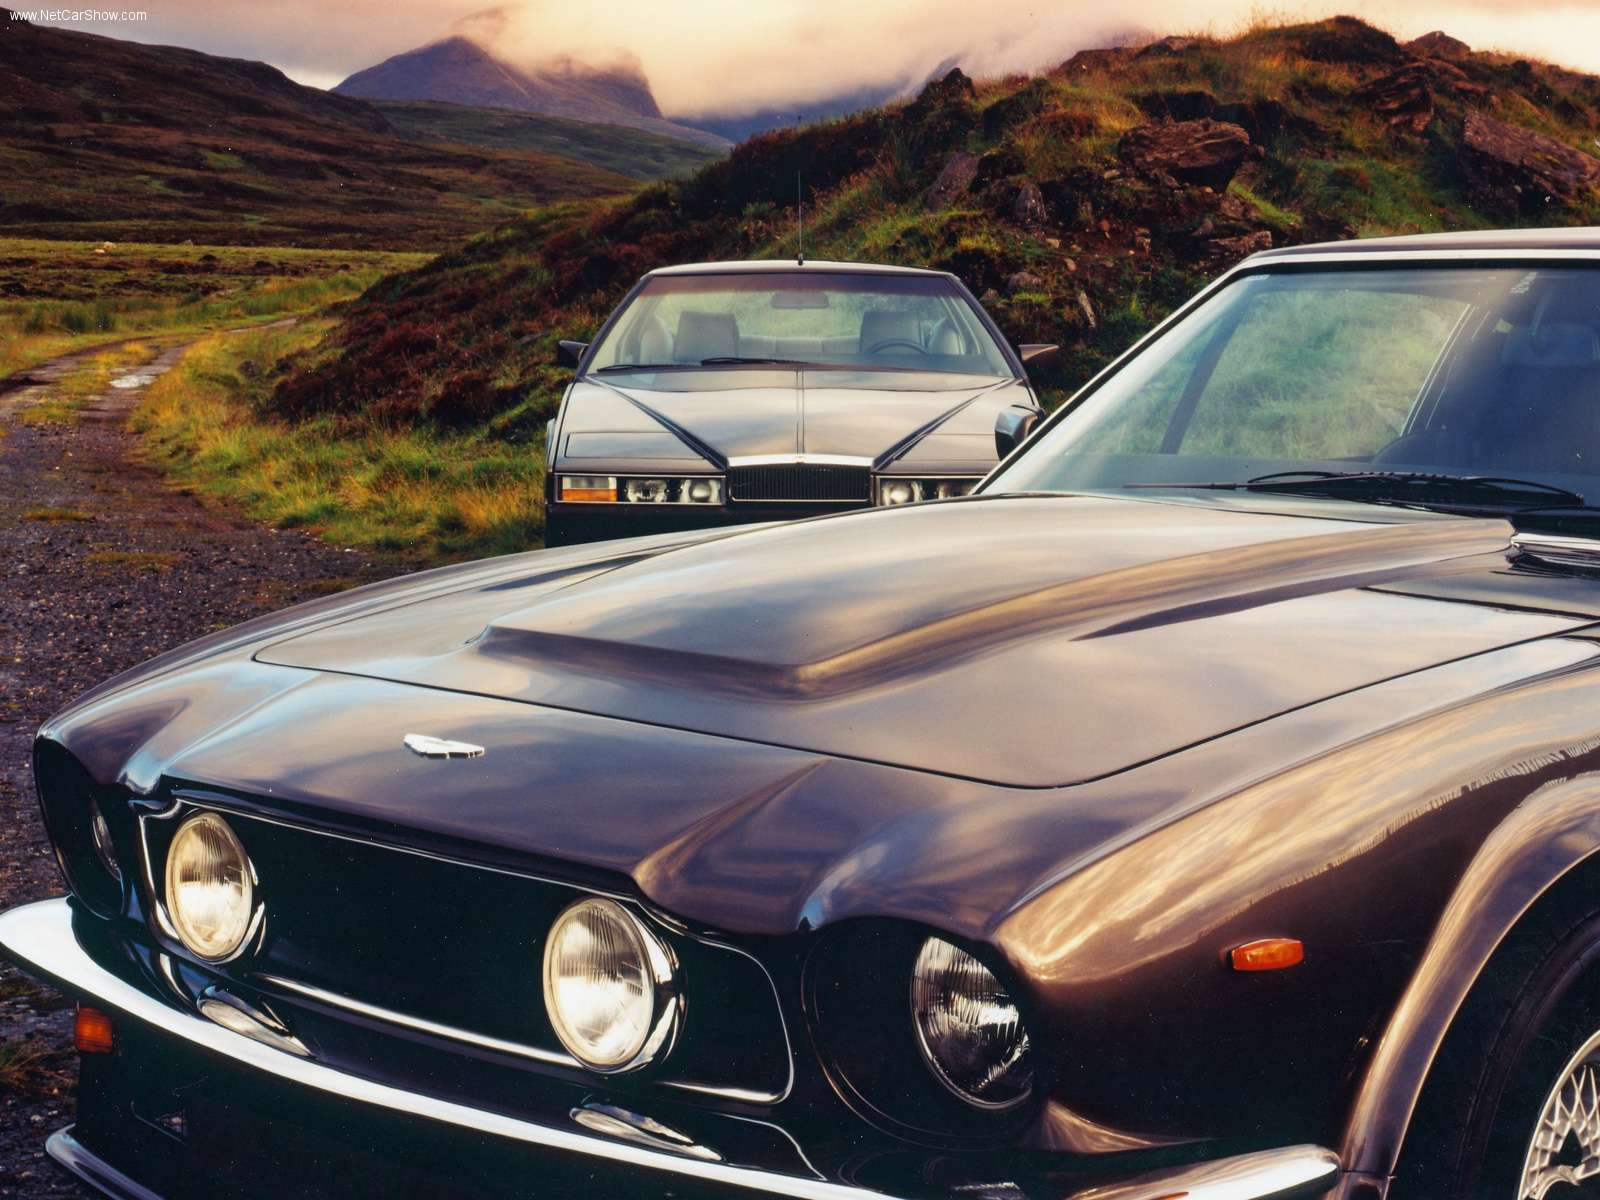 http://2.bp.blogspot.com/_suiHYNm_lag/TNBKLMiIQkI/AAAAAAAACjg/BuB39M0aWm4/s1600/Aston_Martin-Lagonda_1976_1600x1200_wallpaper_06.jpg